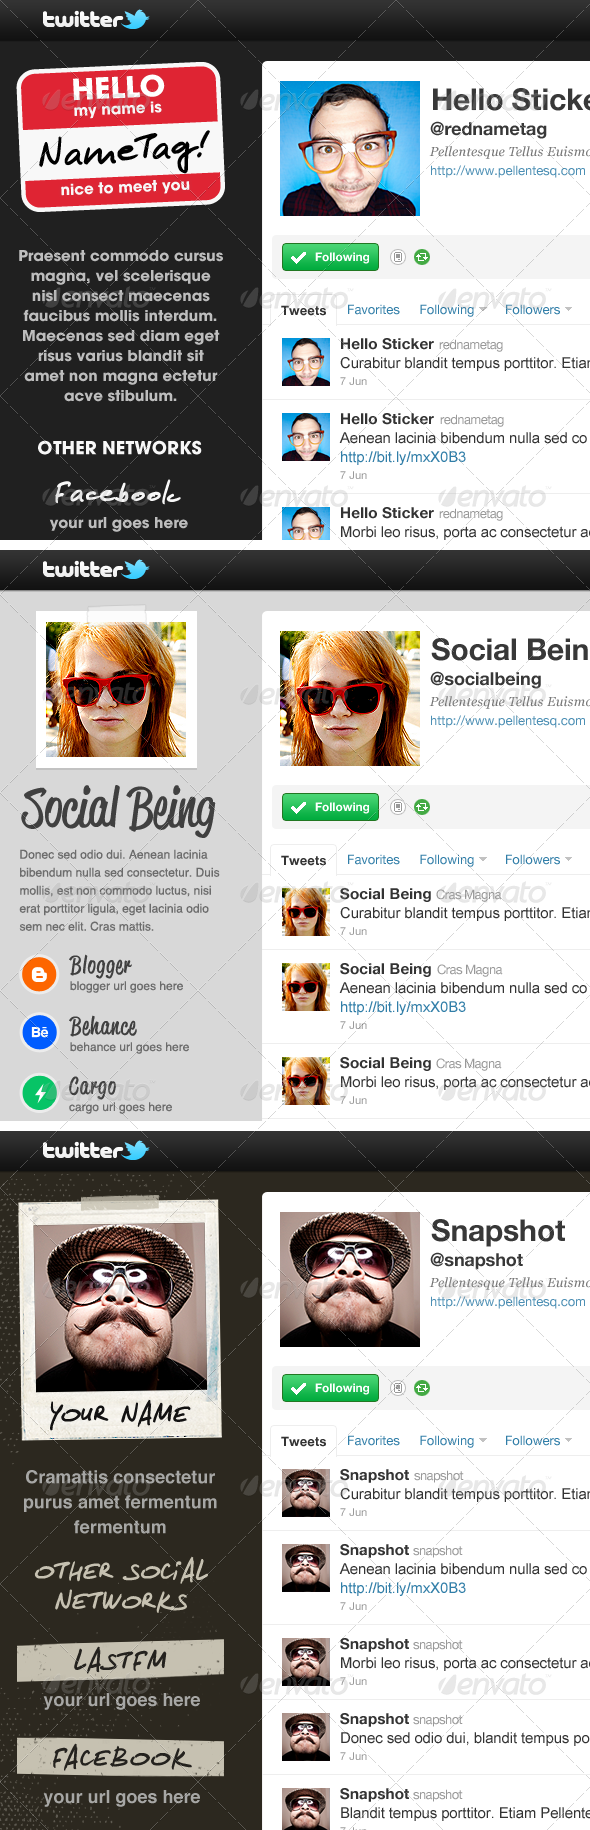 Twitter Background Bundle - Volume One - Twitter Social Media